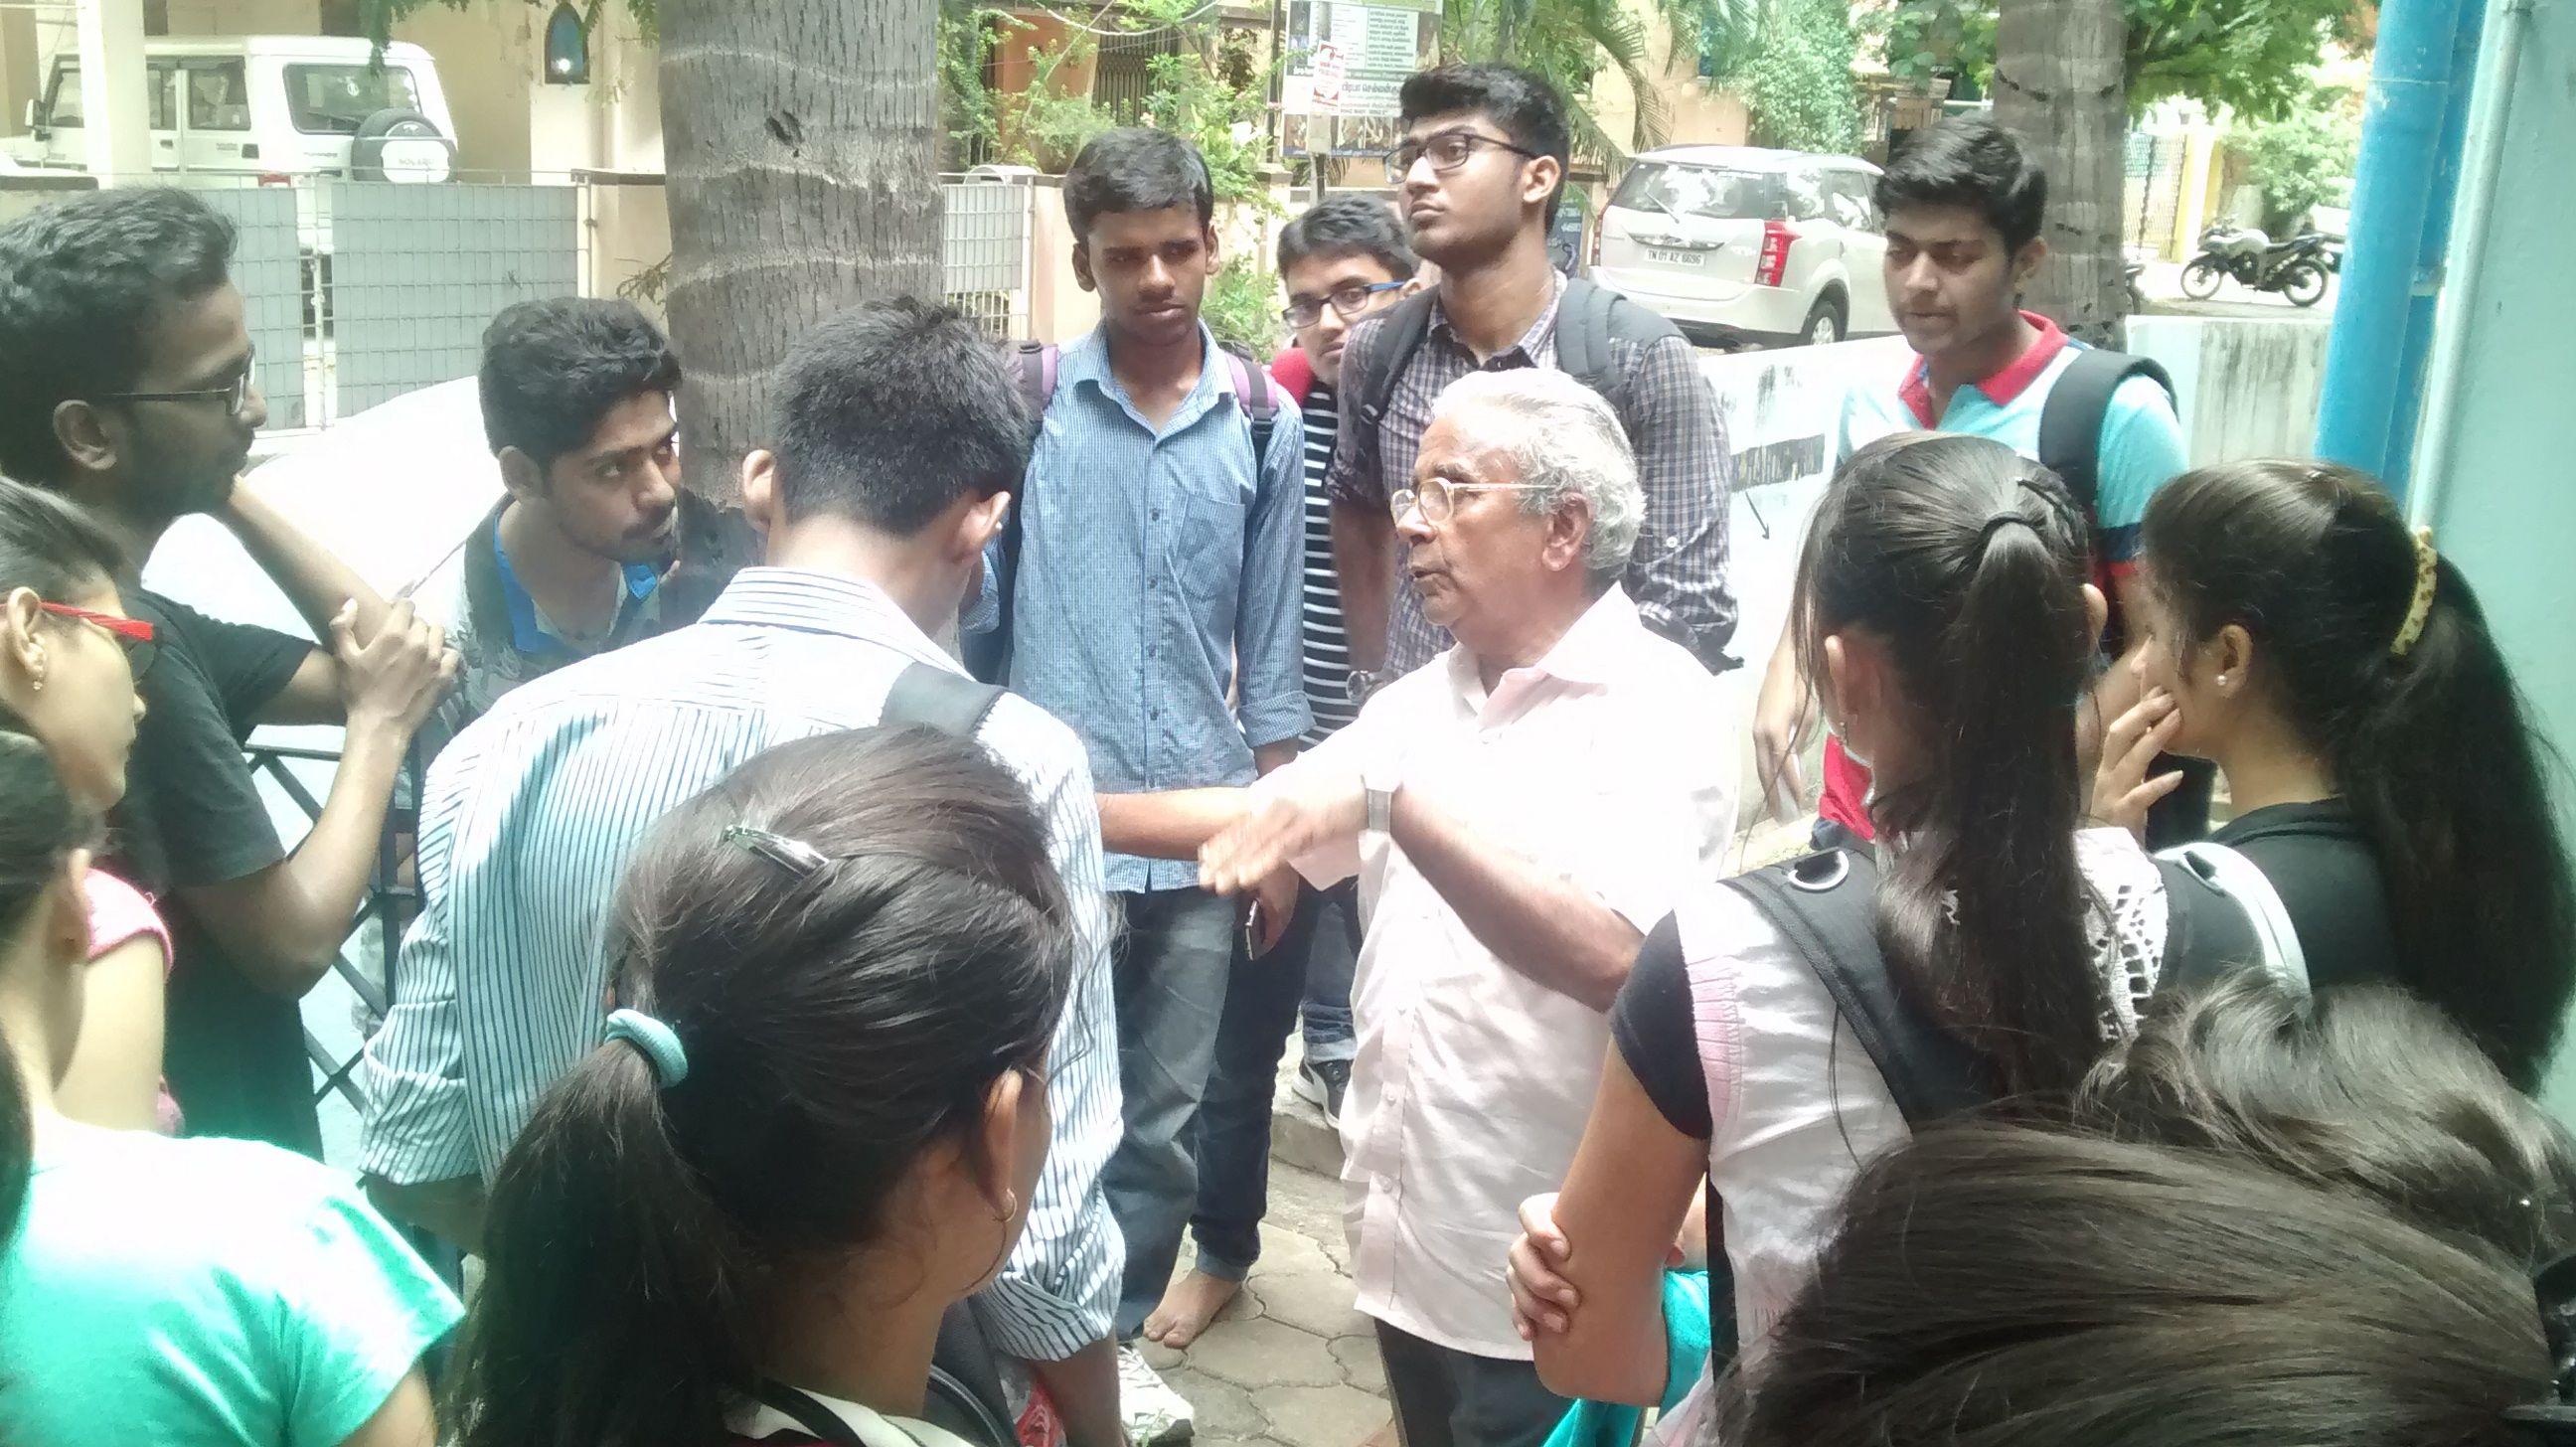 Chennai Water Crisis 71YO 'Rain Man' Helps Hundreds